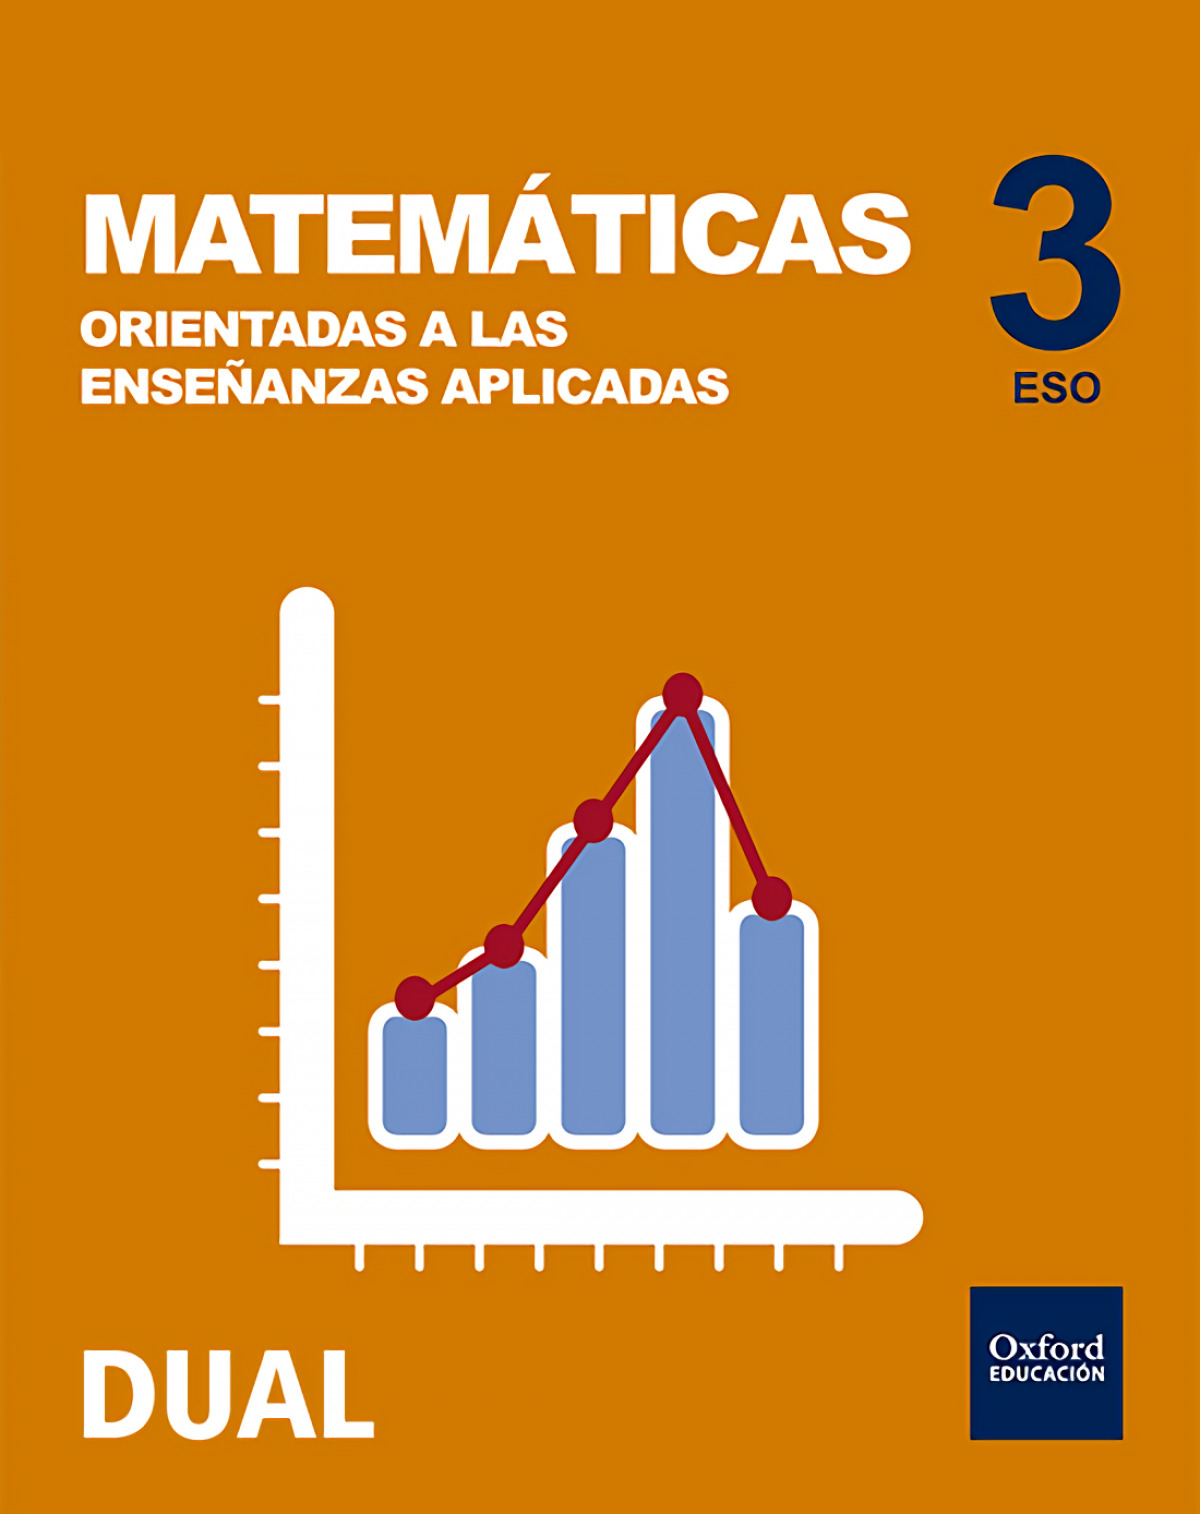 Matemáticas aplicadas 3o.eso. Inicia. Dual. Sólo libro 9780190509033